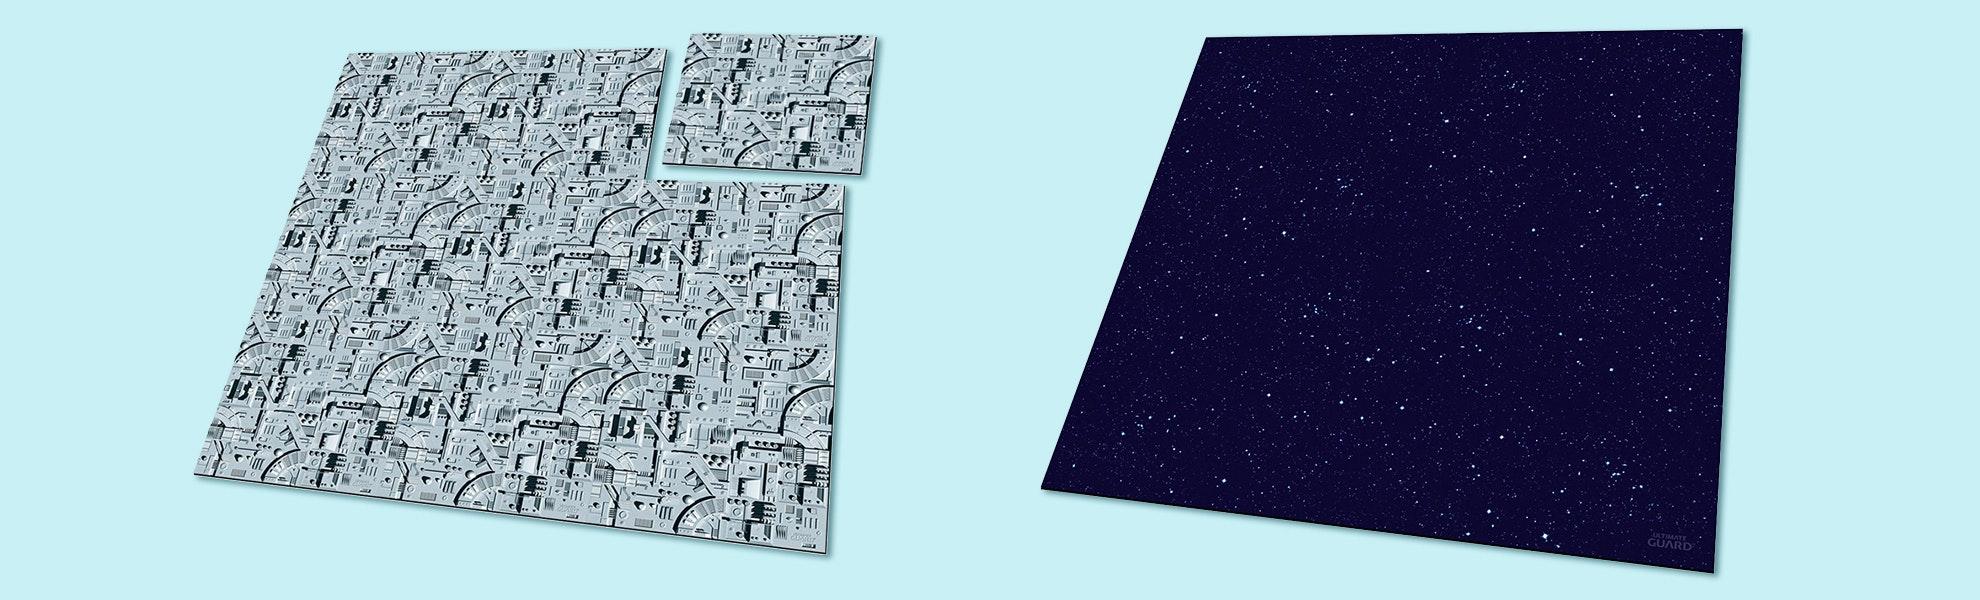 Ultimate Guard 3' Battle Mat and Tiles Bundle